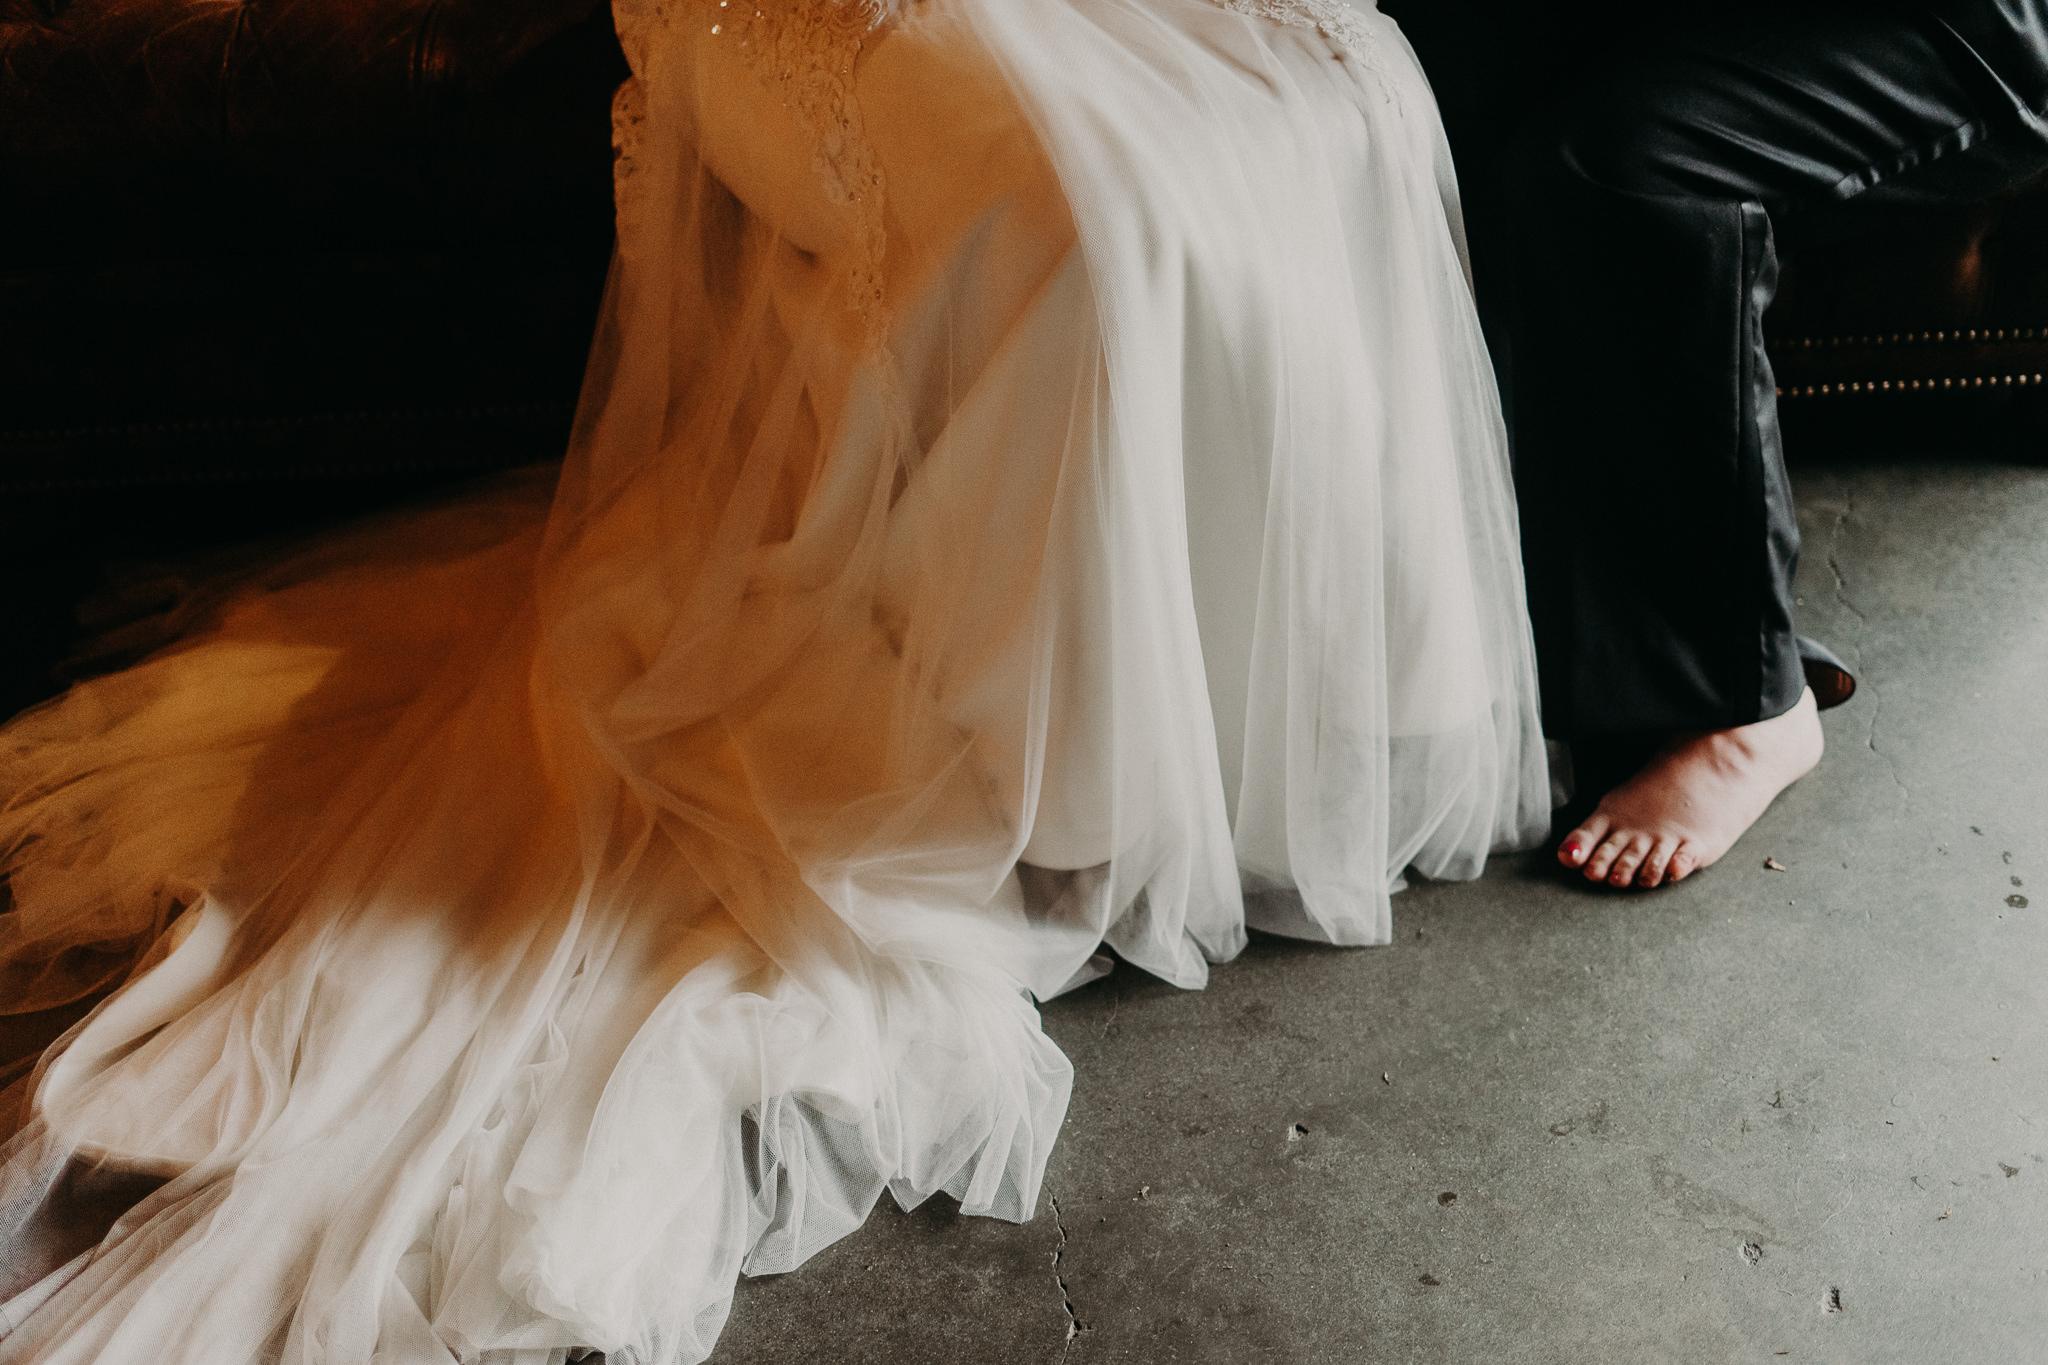 Dress Gown Pant Suit Wedding Feet